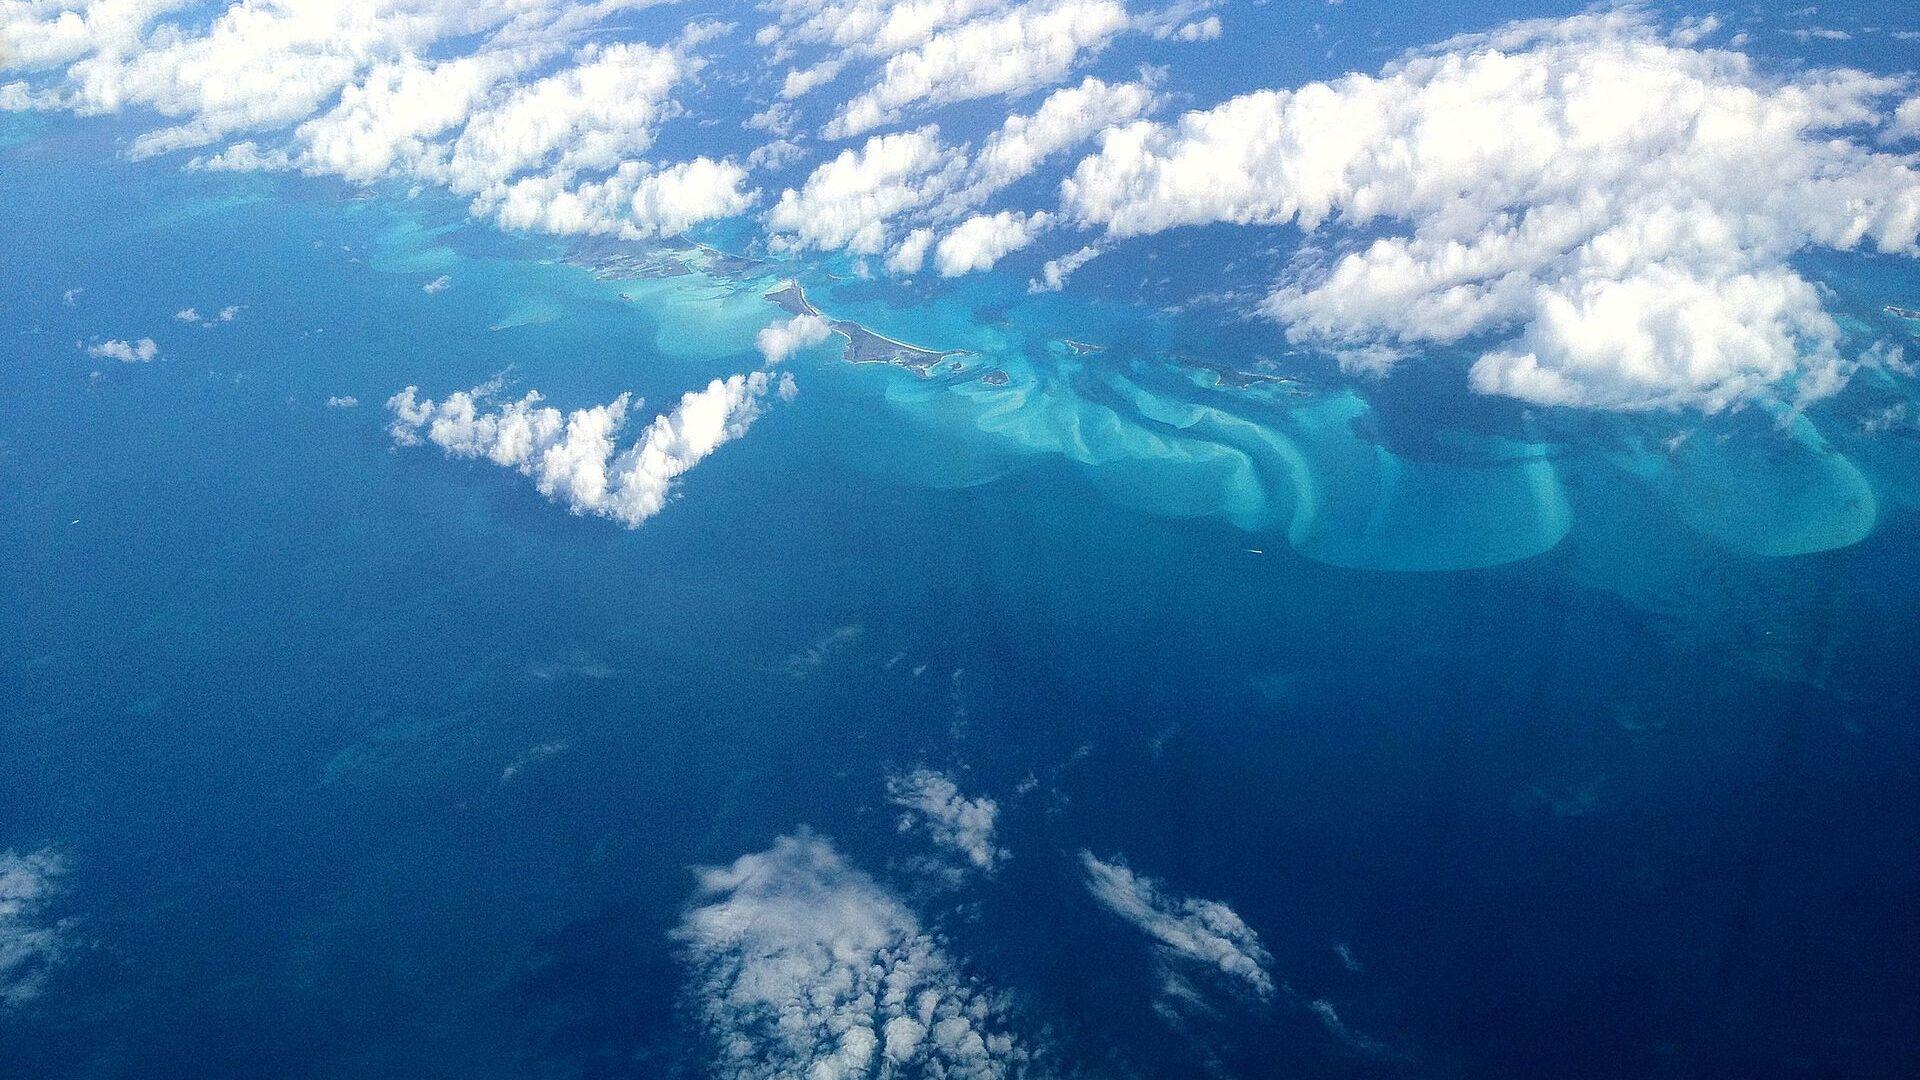 Le isole Bermuda - Sputnik Italia, 1920, 05.09.2021